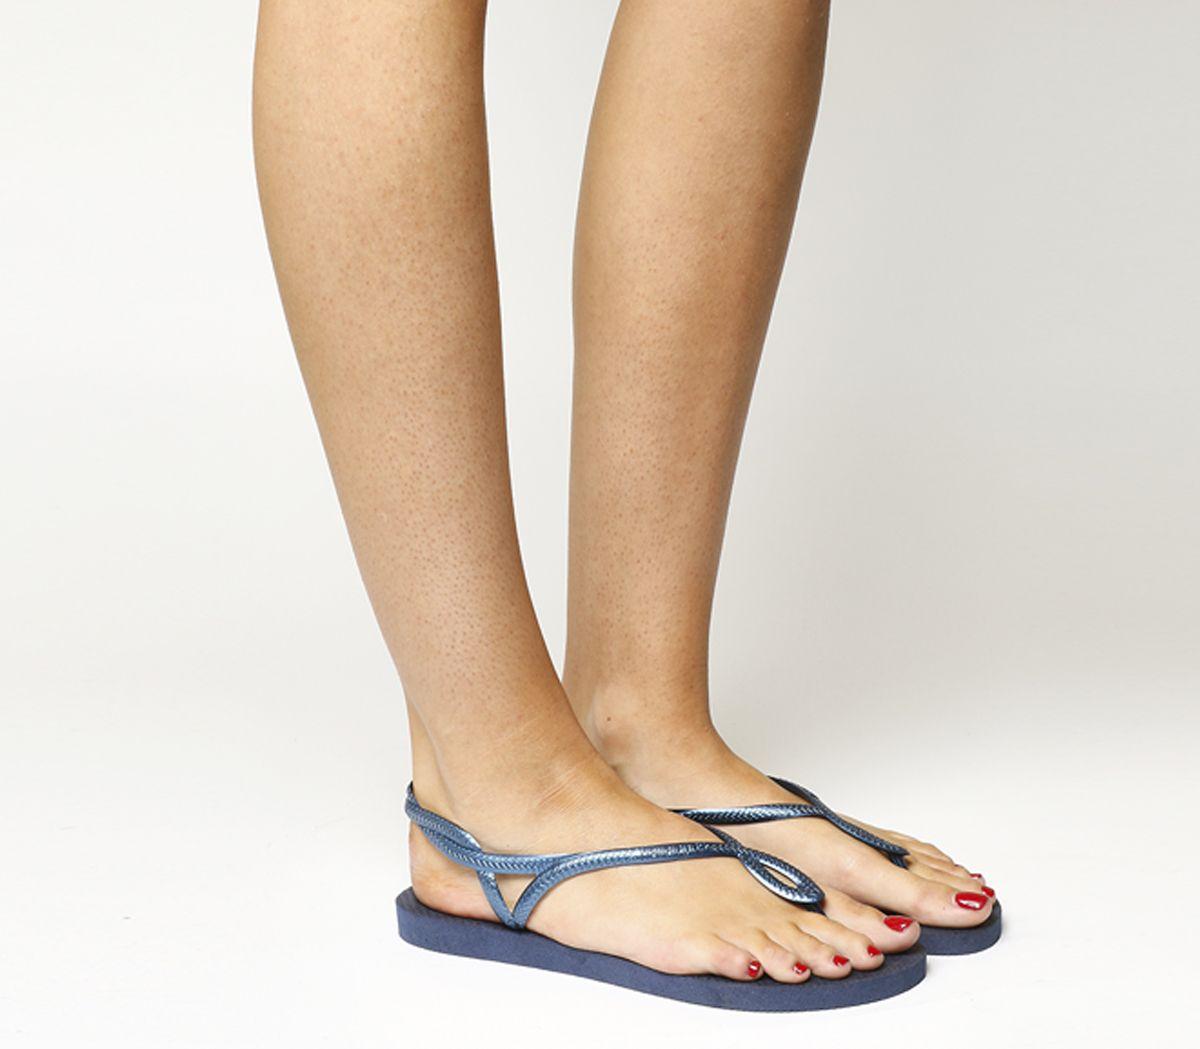 80c47b260 Havaianas Luna Navy Blue - Sandals